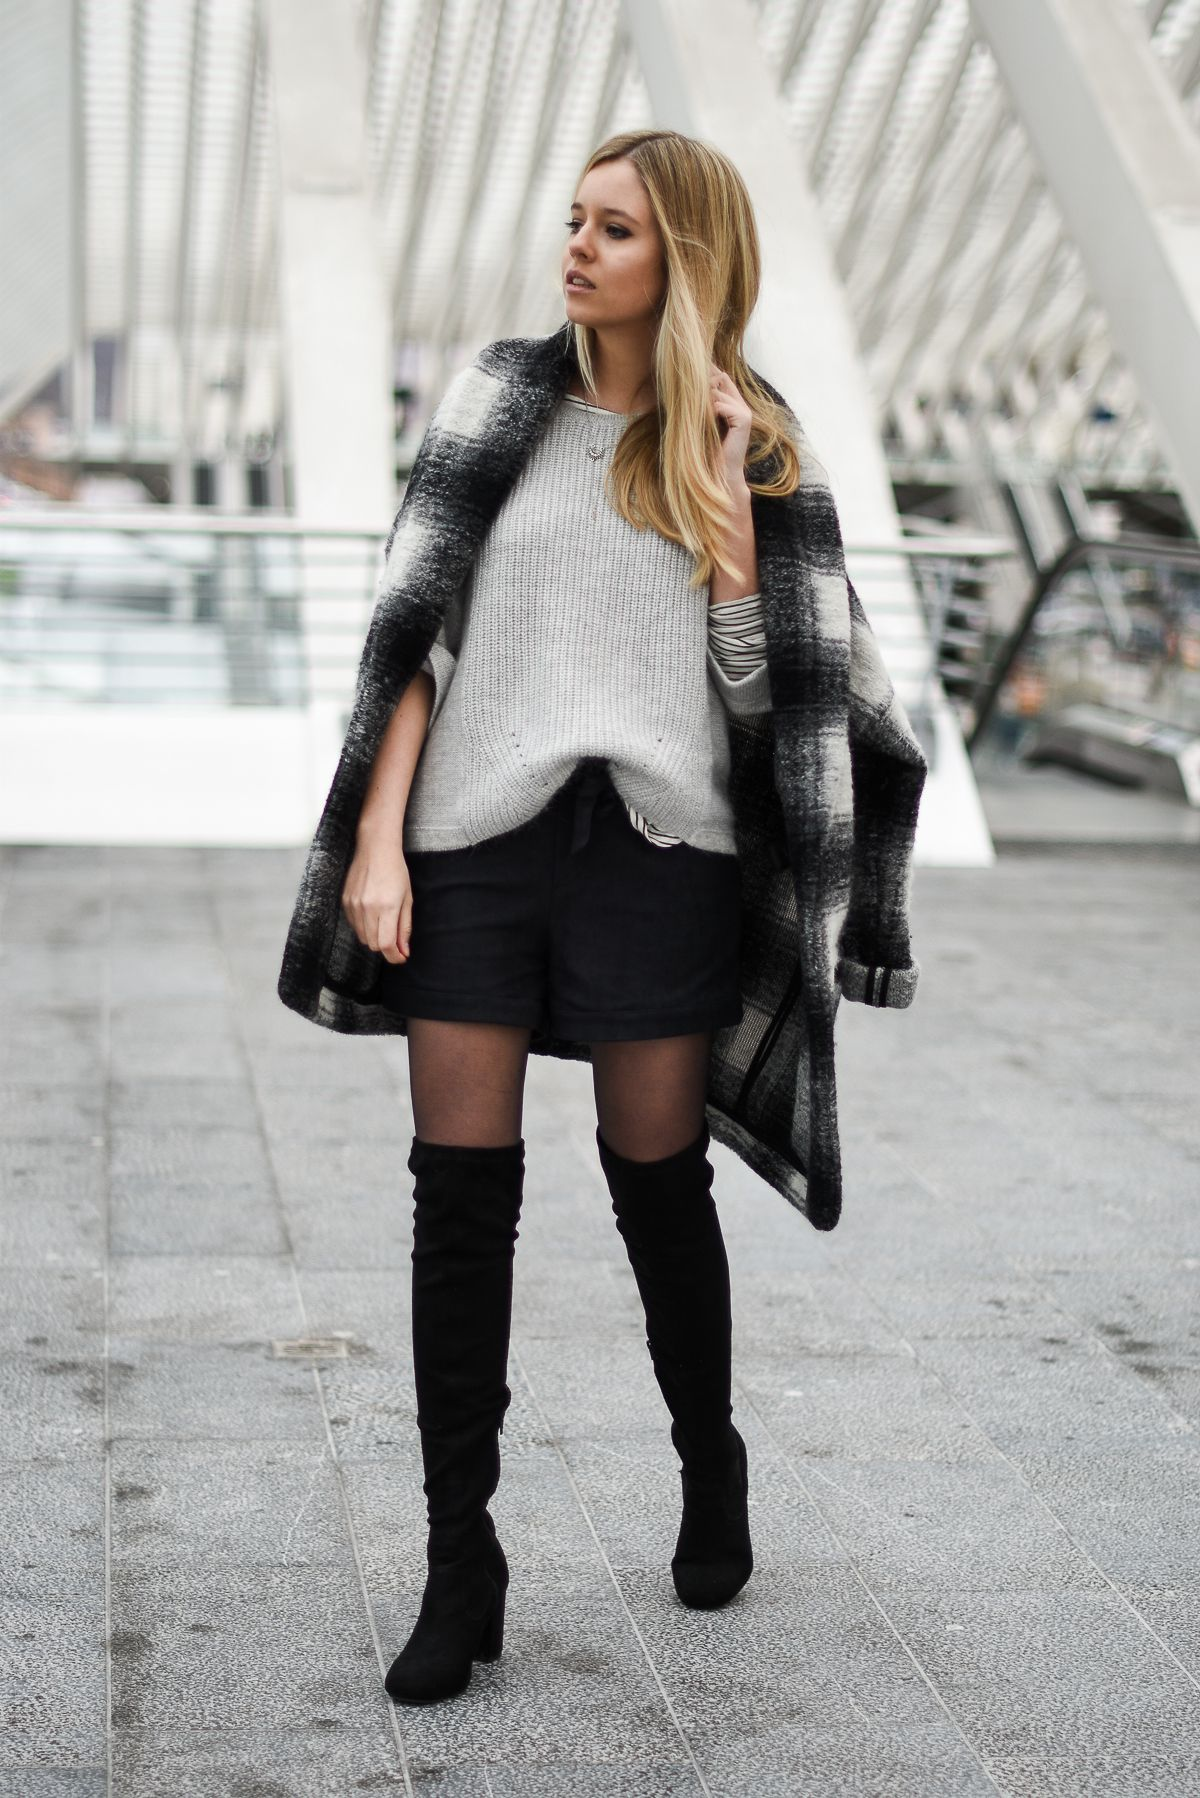 cuissardes short en daim pull large manteau oversize i need looks to be inspired. Black Bedroom Furniture Sets. Home Design Ideas